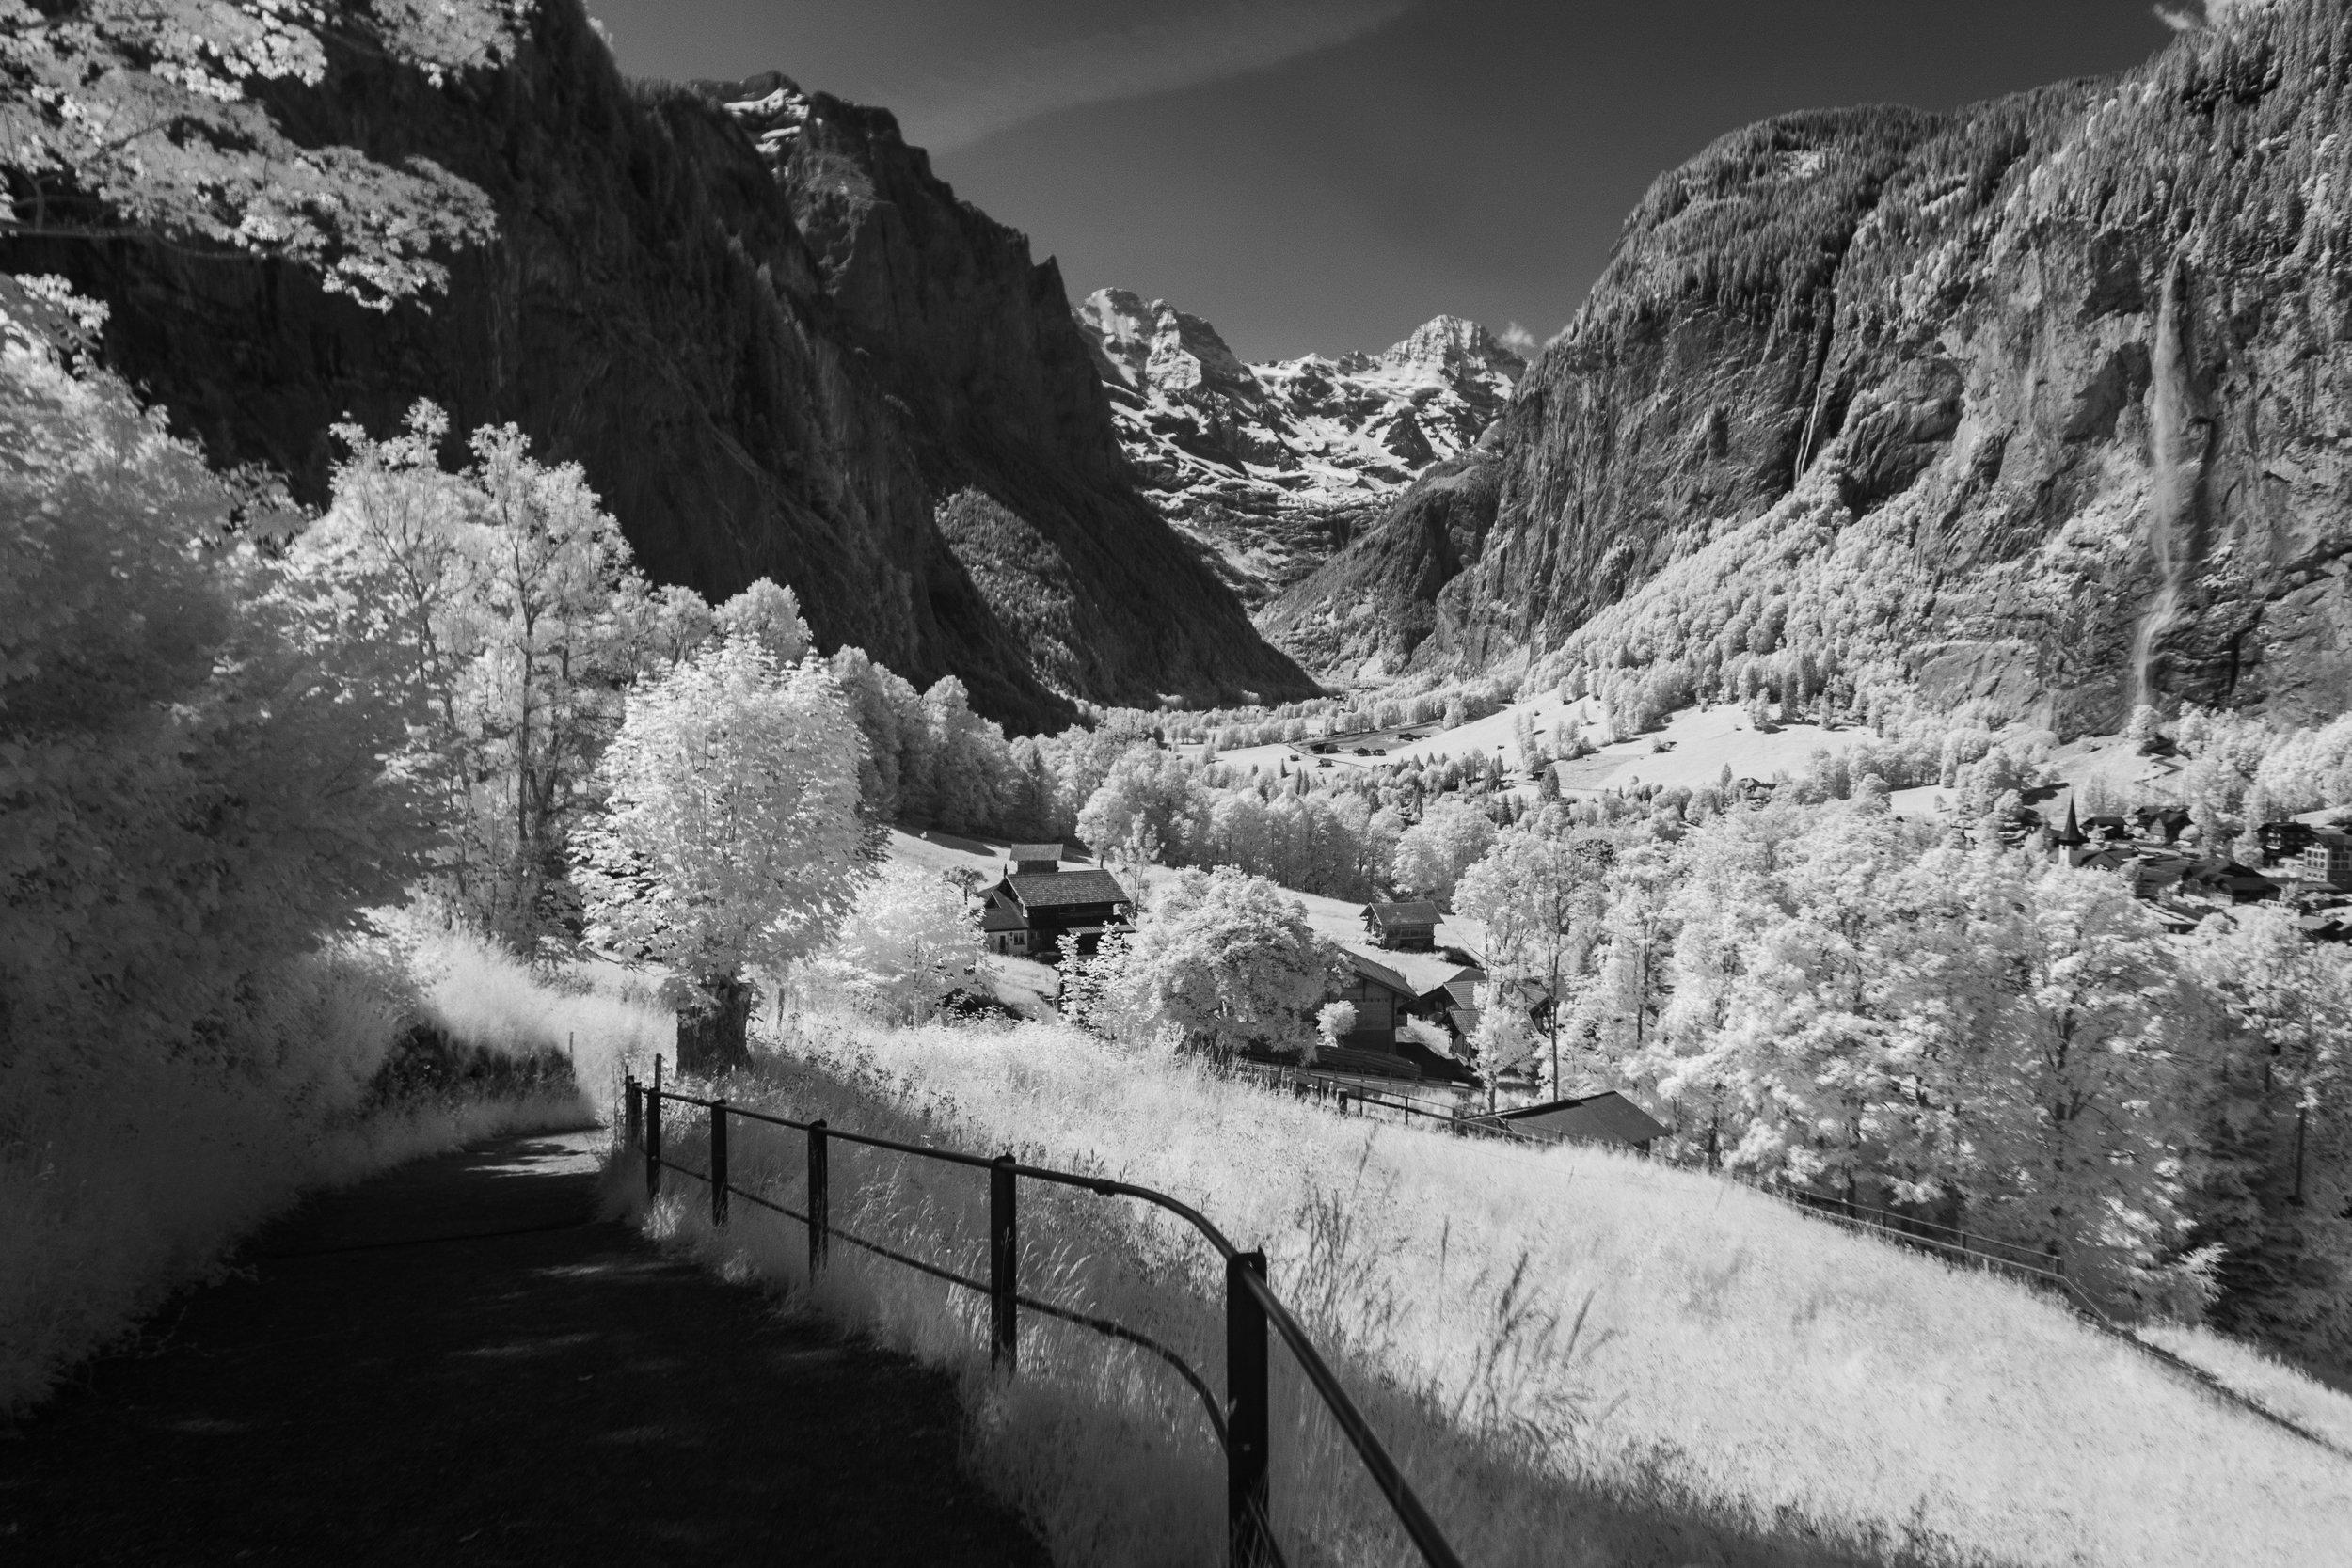 The Valley of 72 Waterfalls, Lauterbrunnen